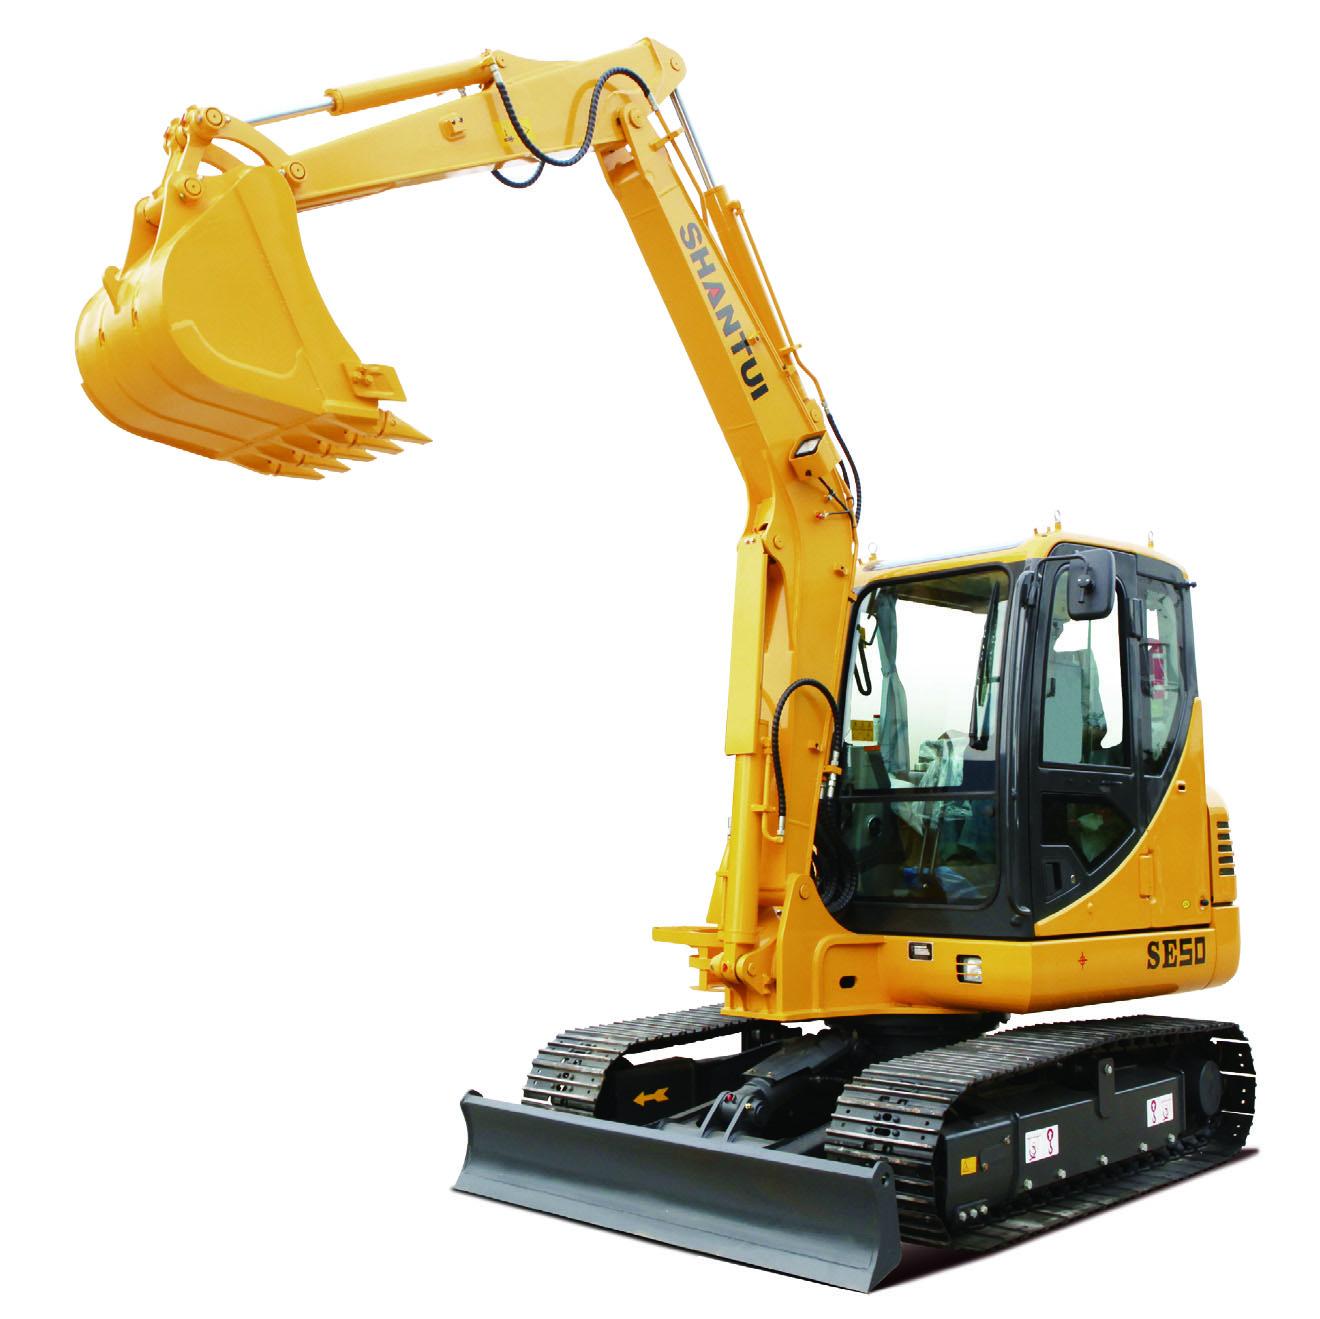 Shantui Small 5.28ton Crawler Excavator